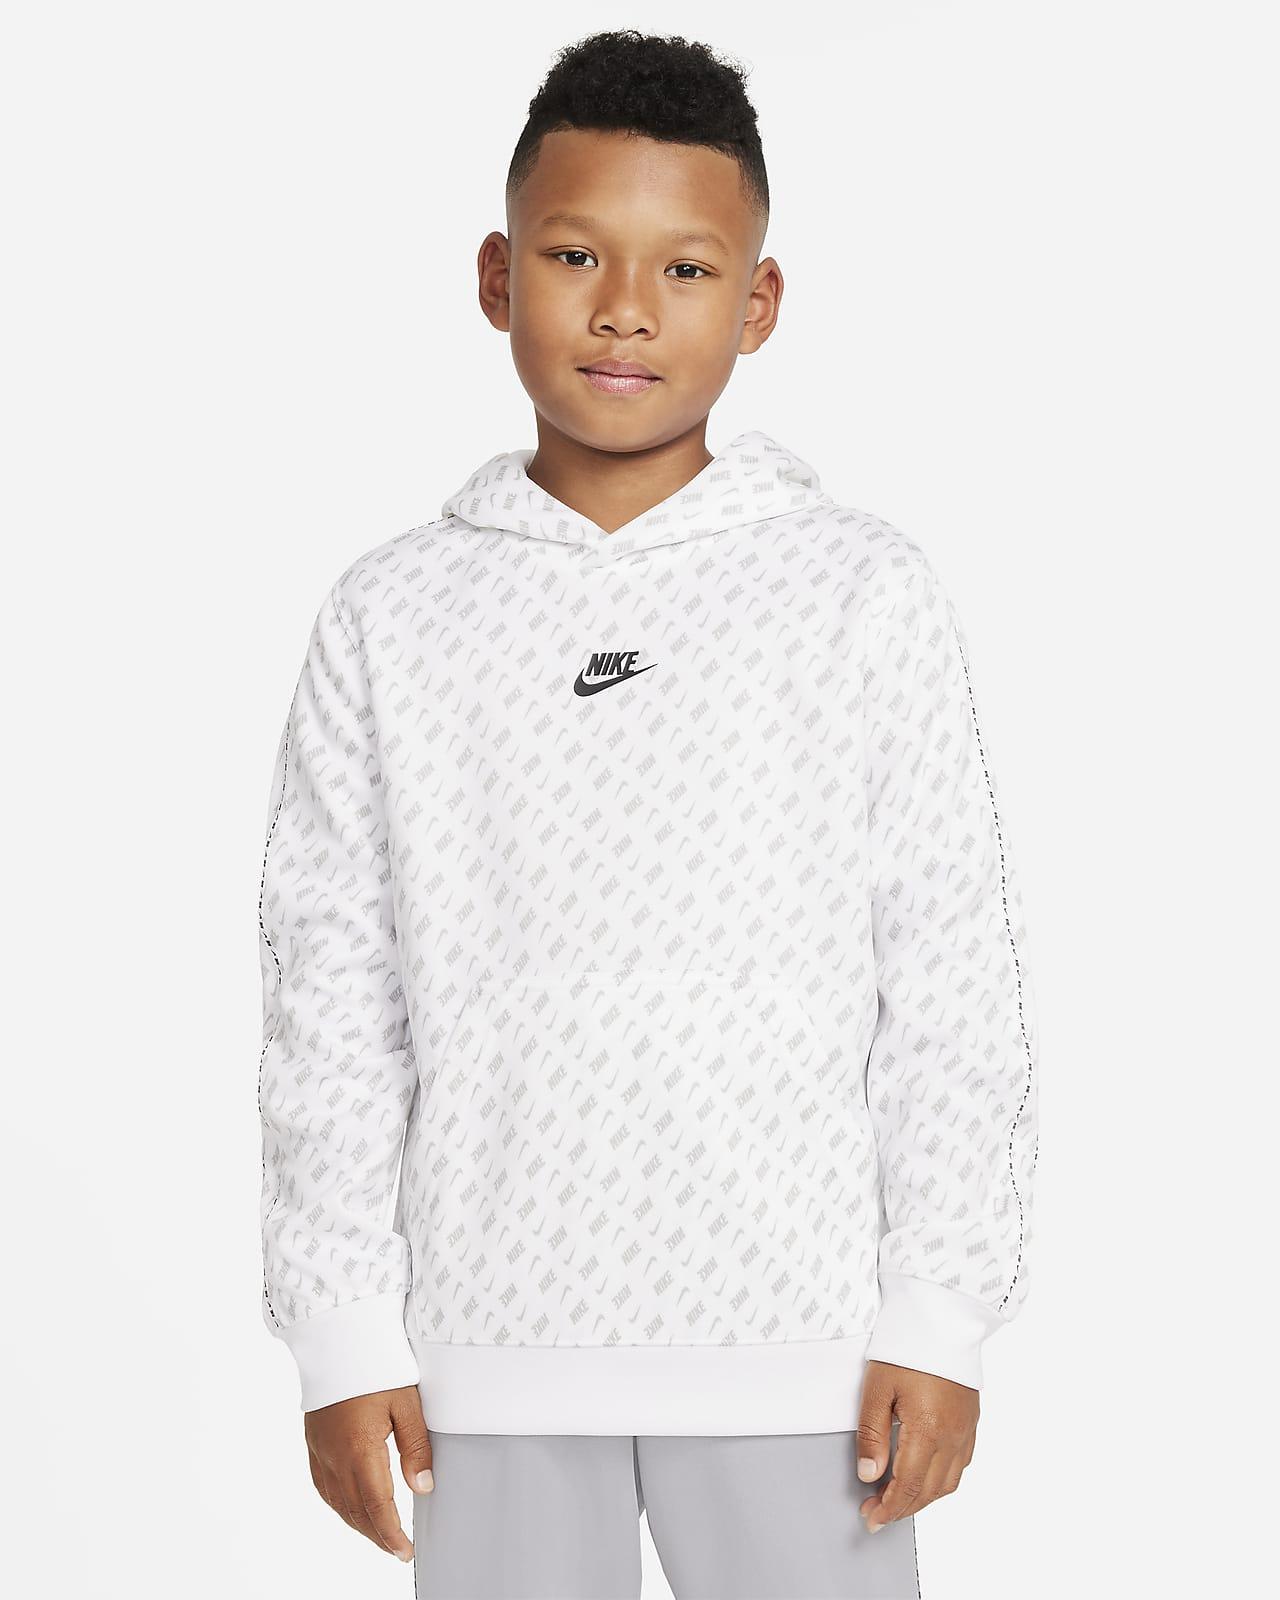 Nike Sportswear Genç Çocuk (Erkek) Kapüşonlu Üst